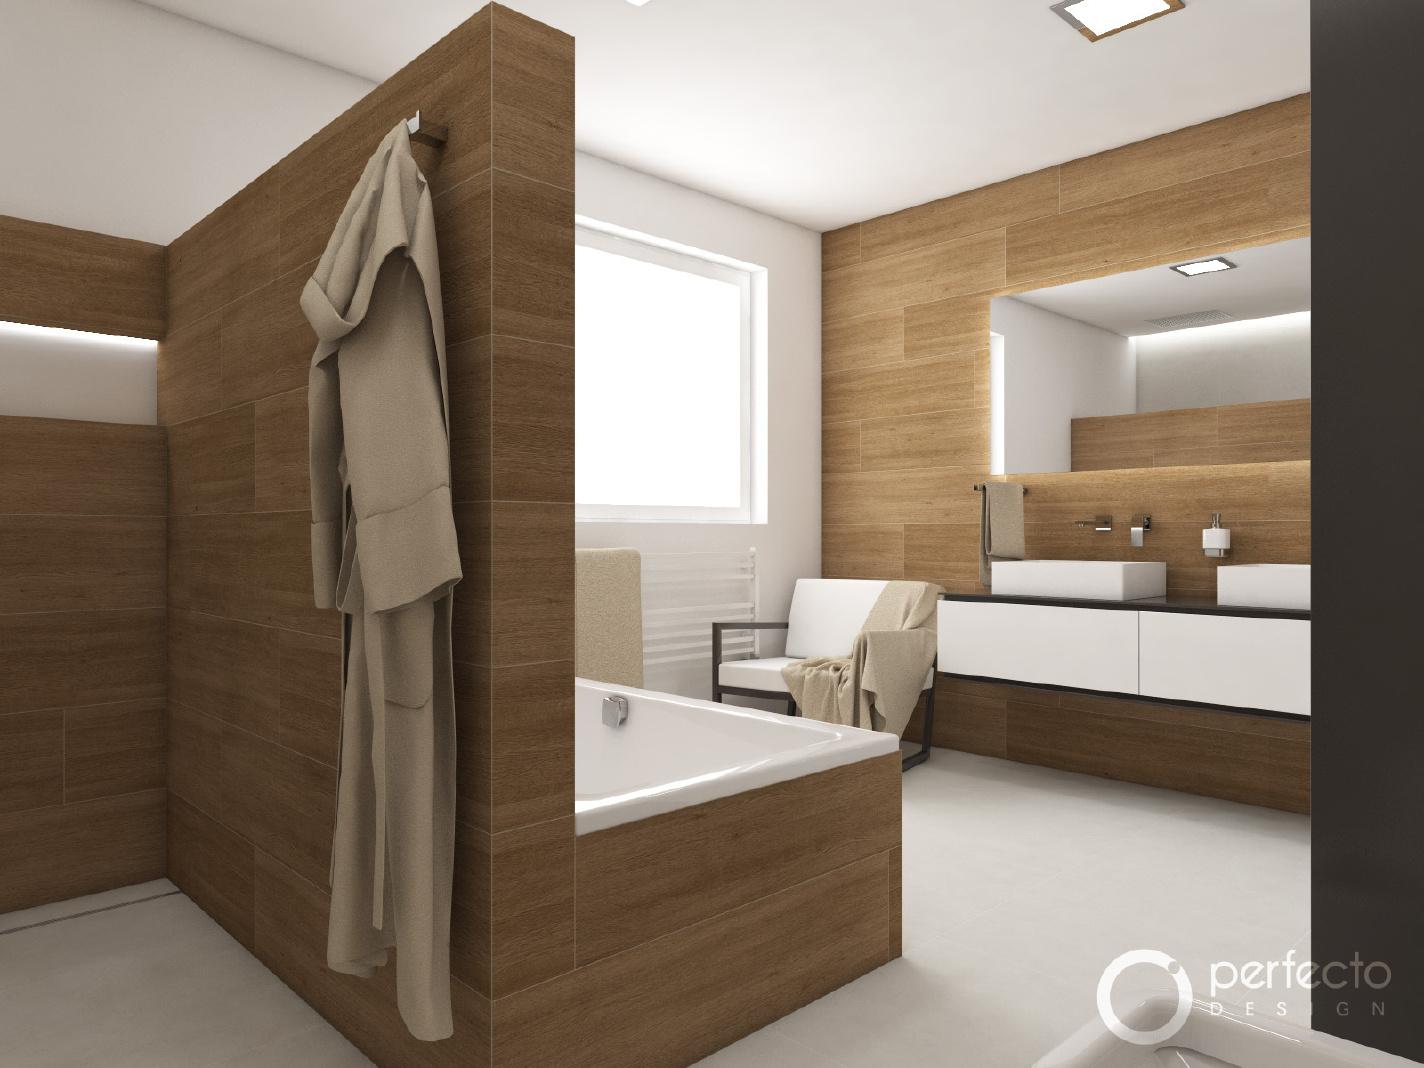 modernes badezimmer havana | perfecto design - Modernes Badezimmer